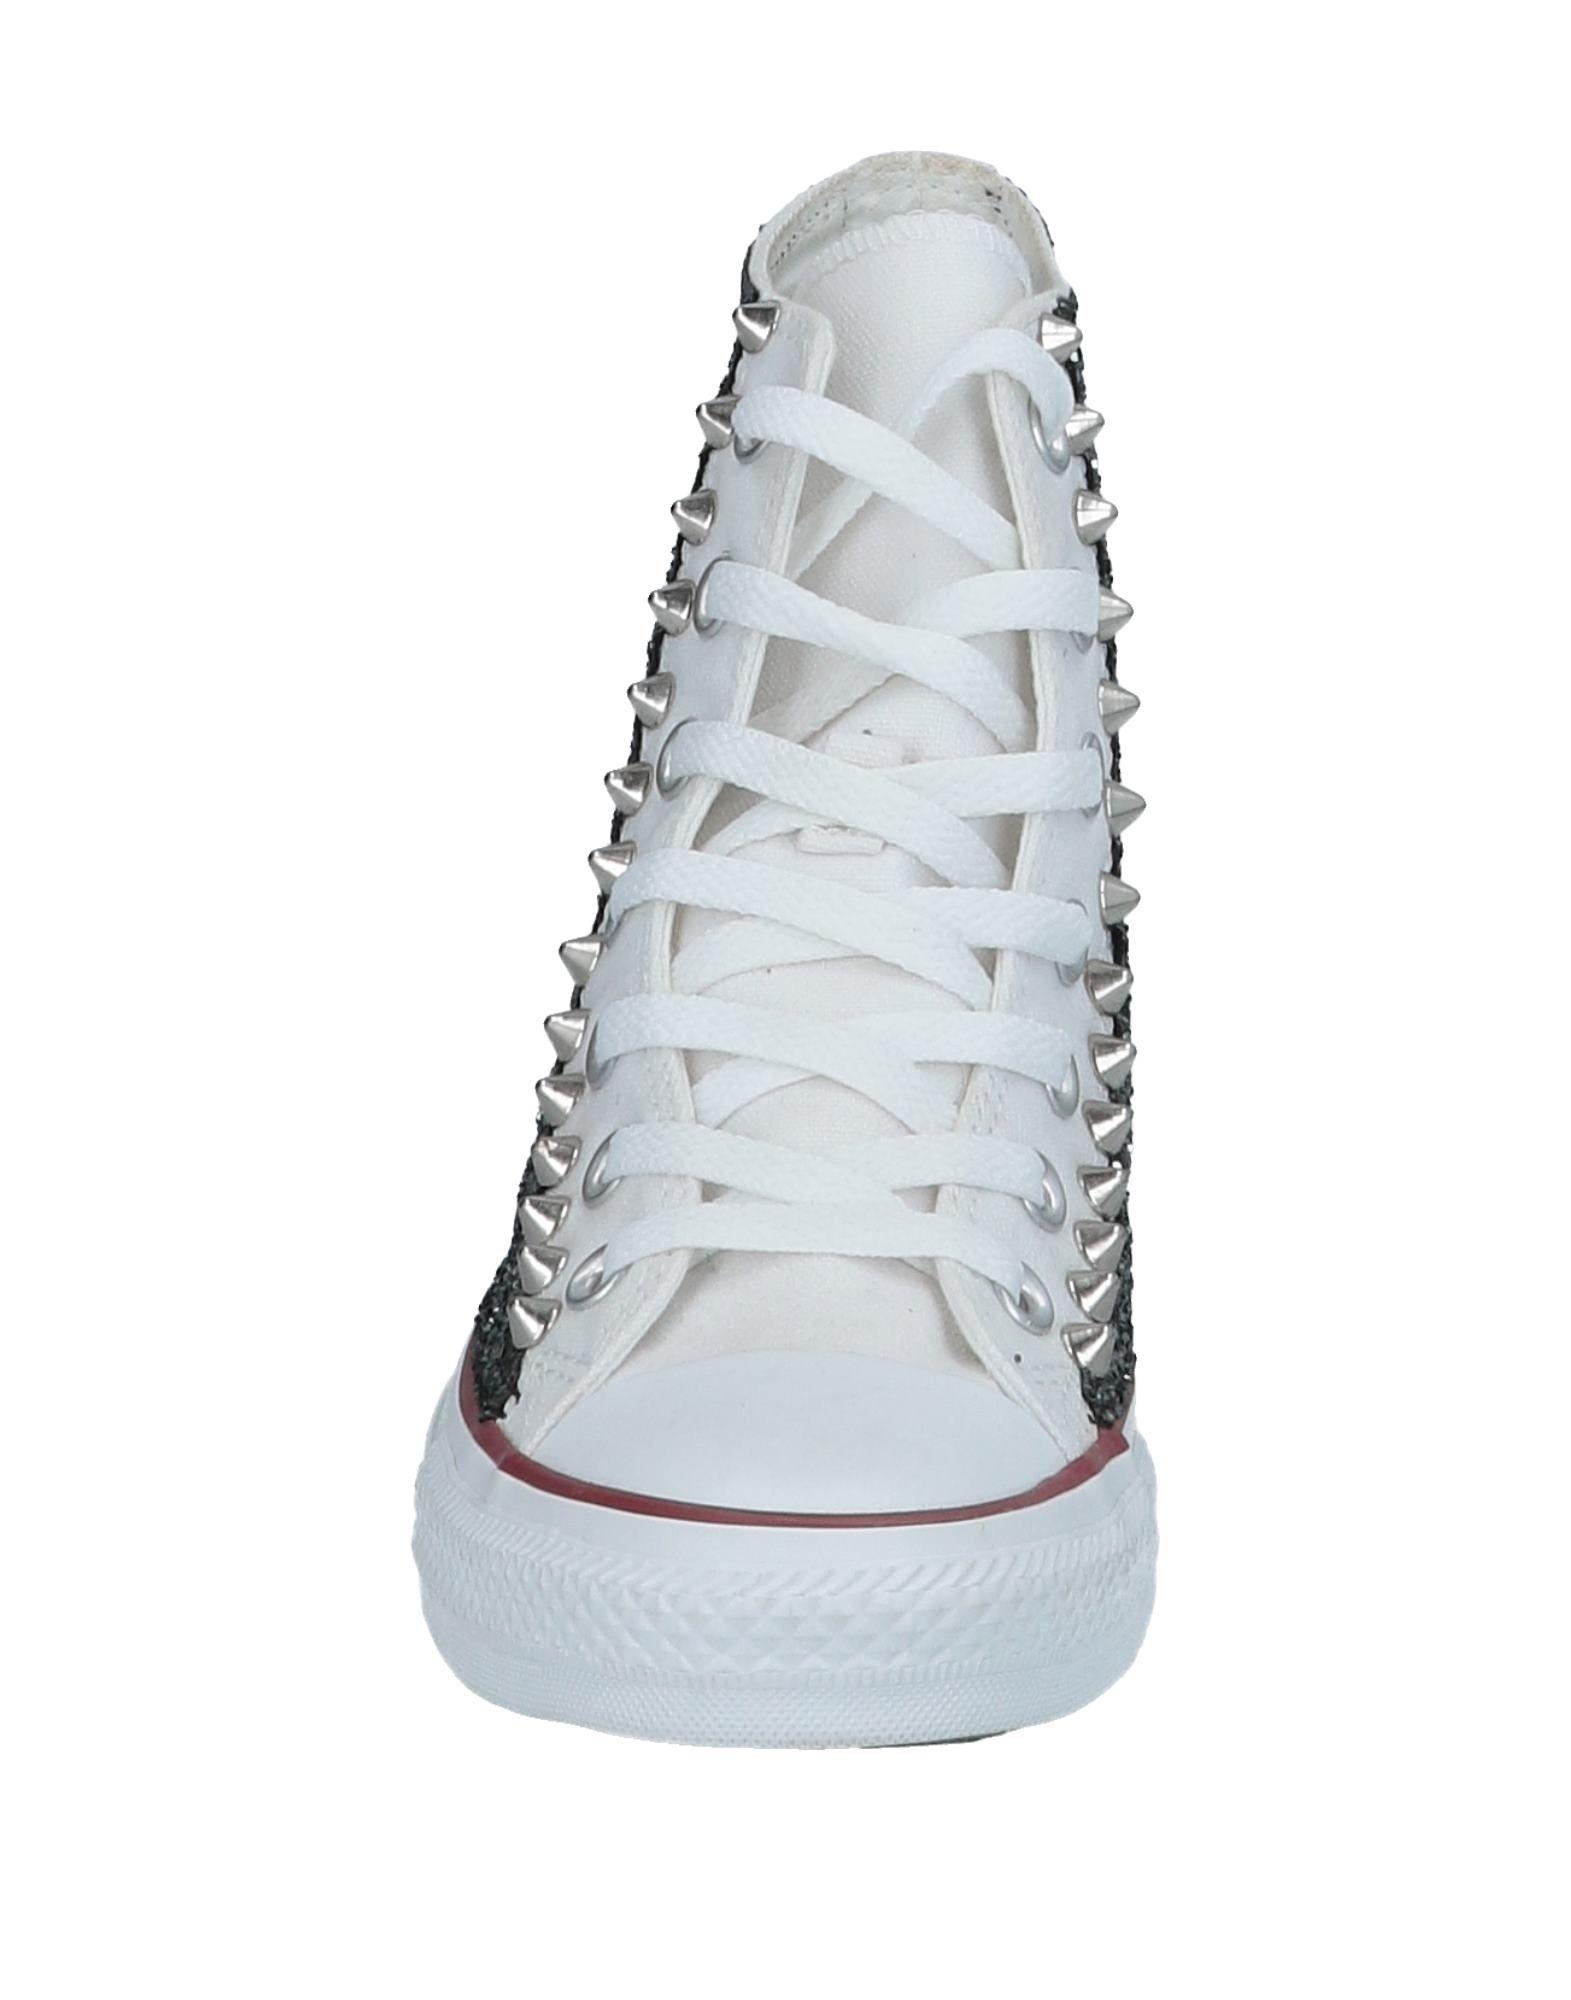 Gut Star um billige Schuhe zu tragenConverse All Star Gut Sneakers Damen  11511962LA 59e980